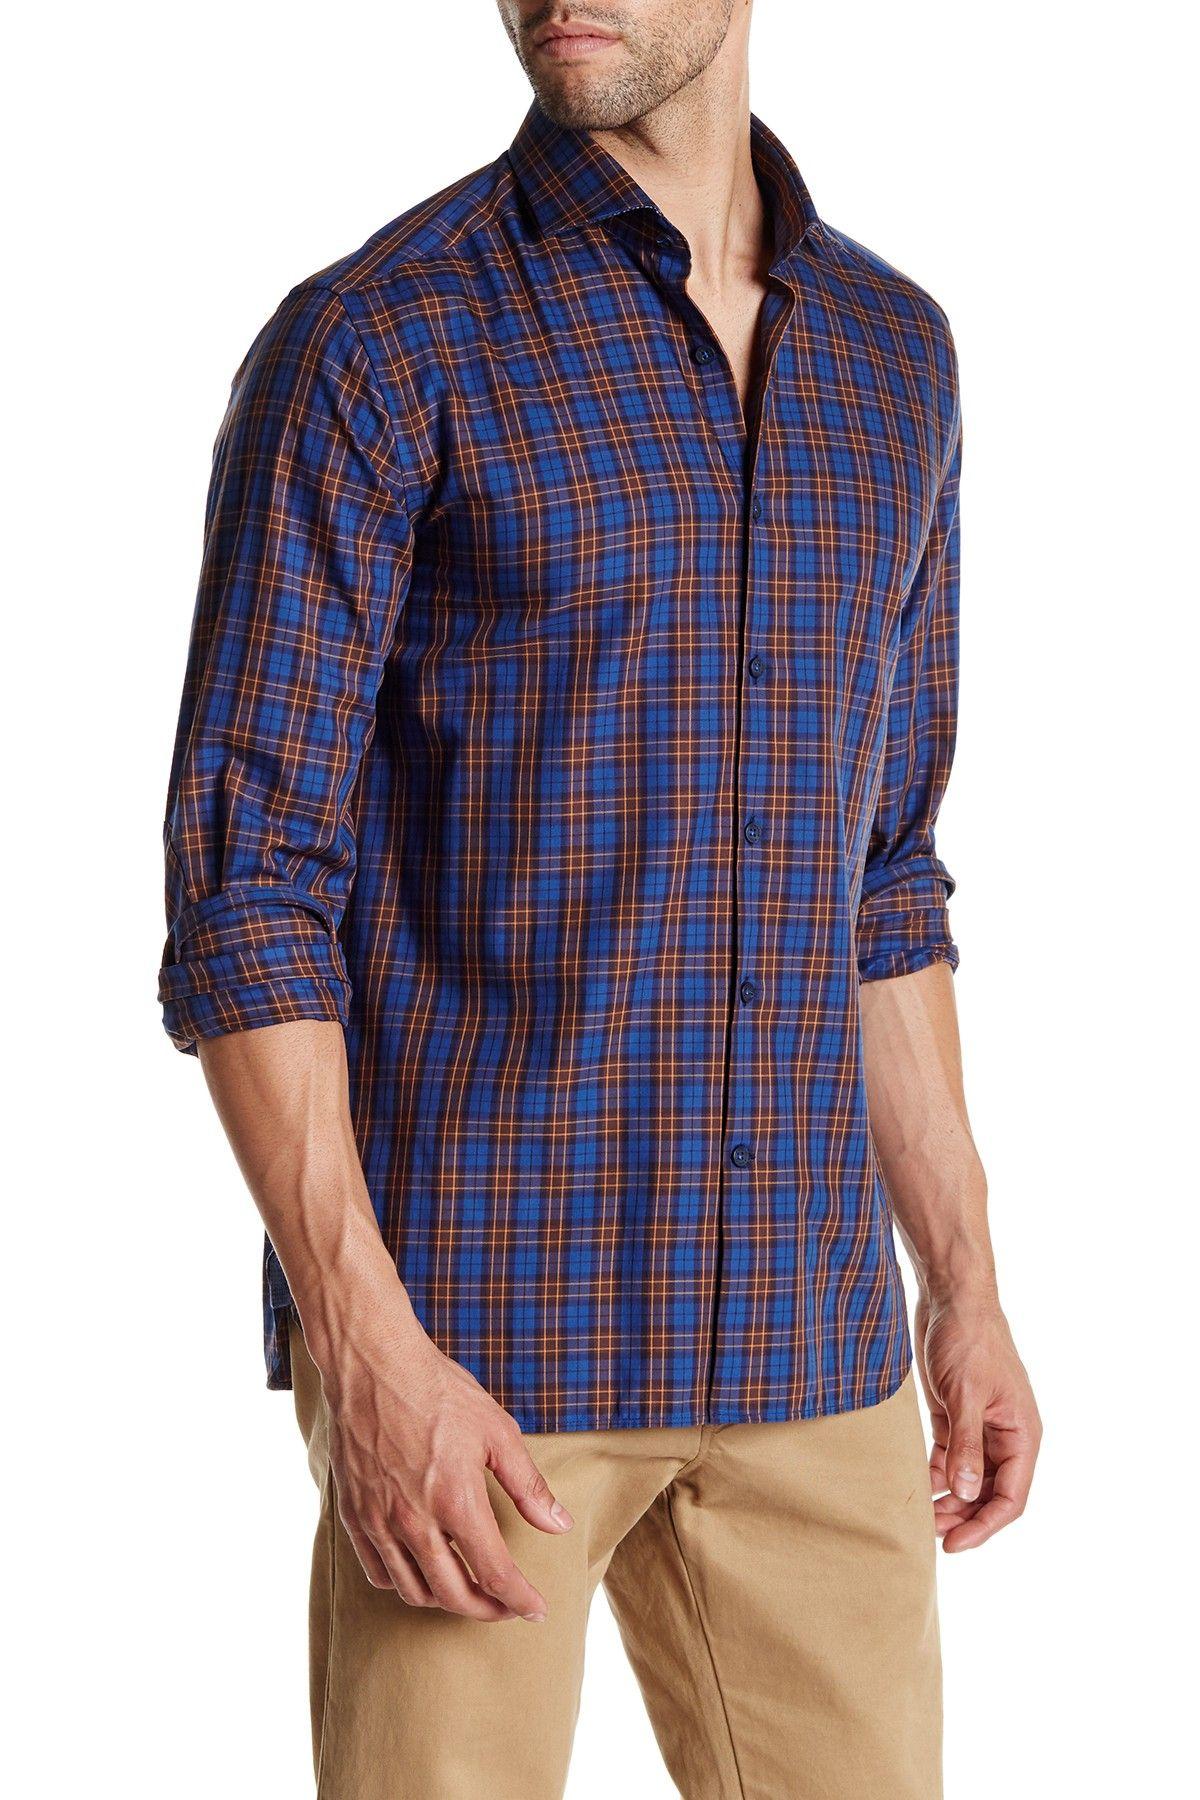 Regular Fit Tartan Plaid Long Sleeve Shirt